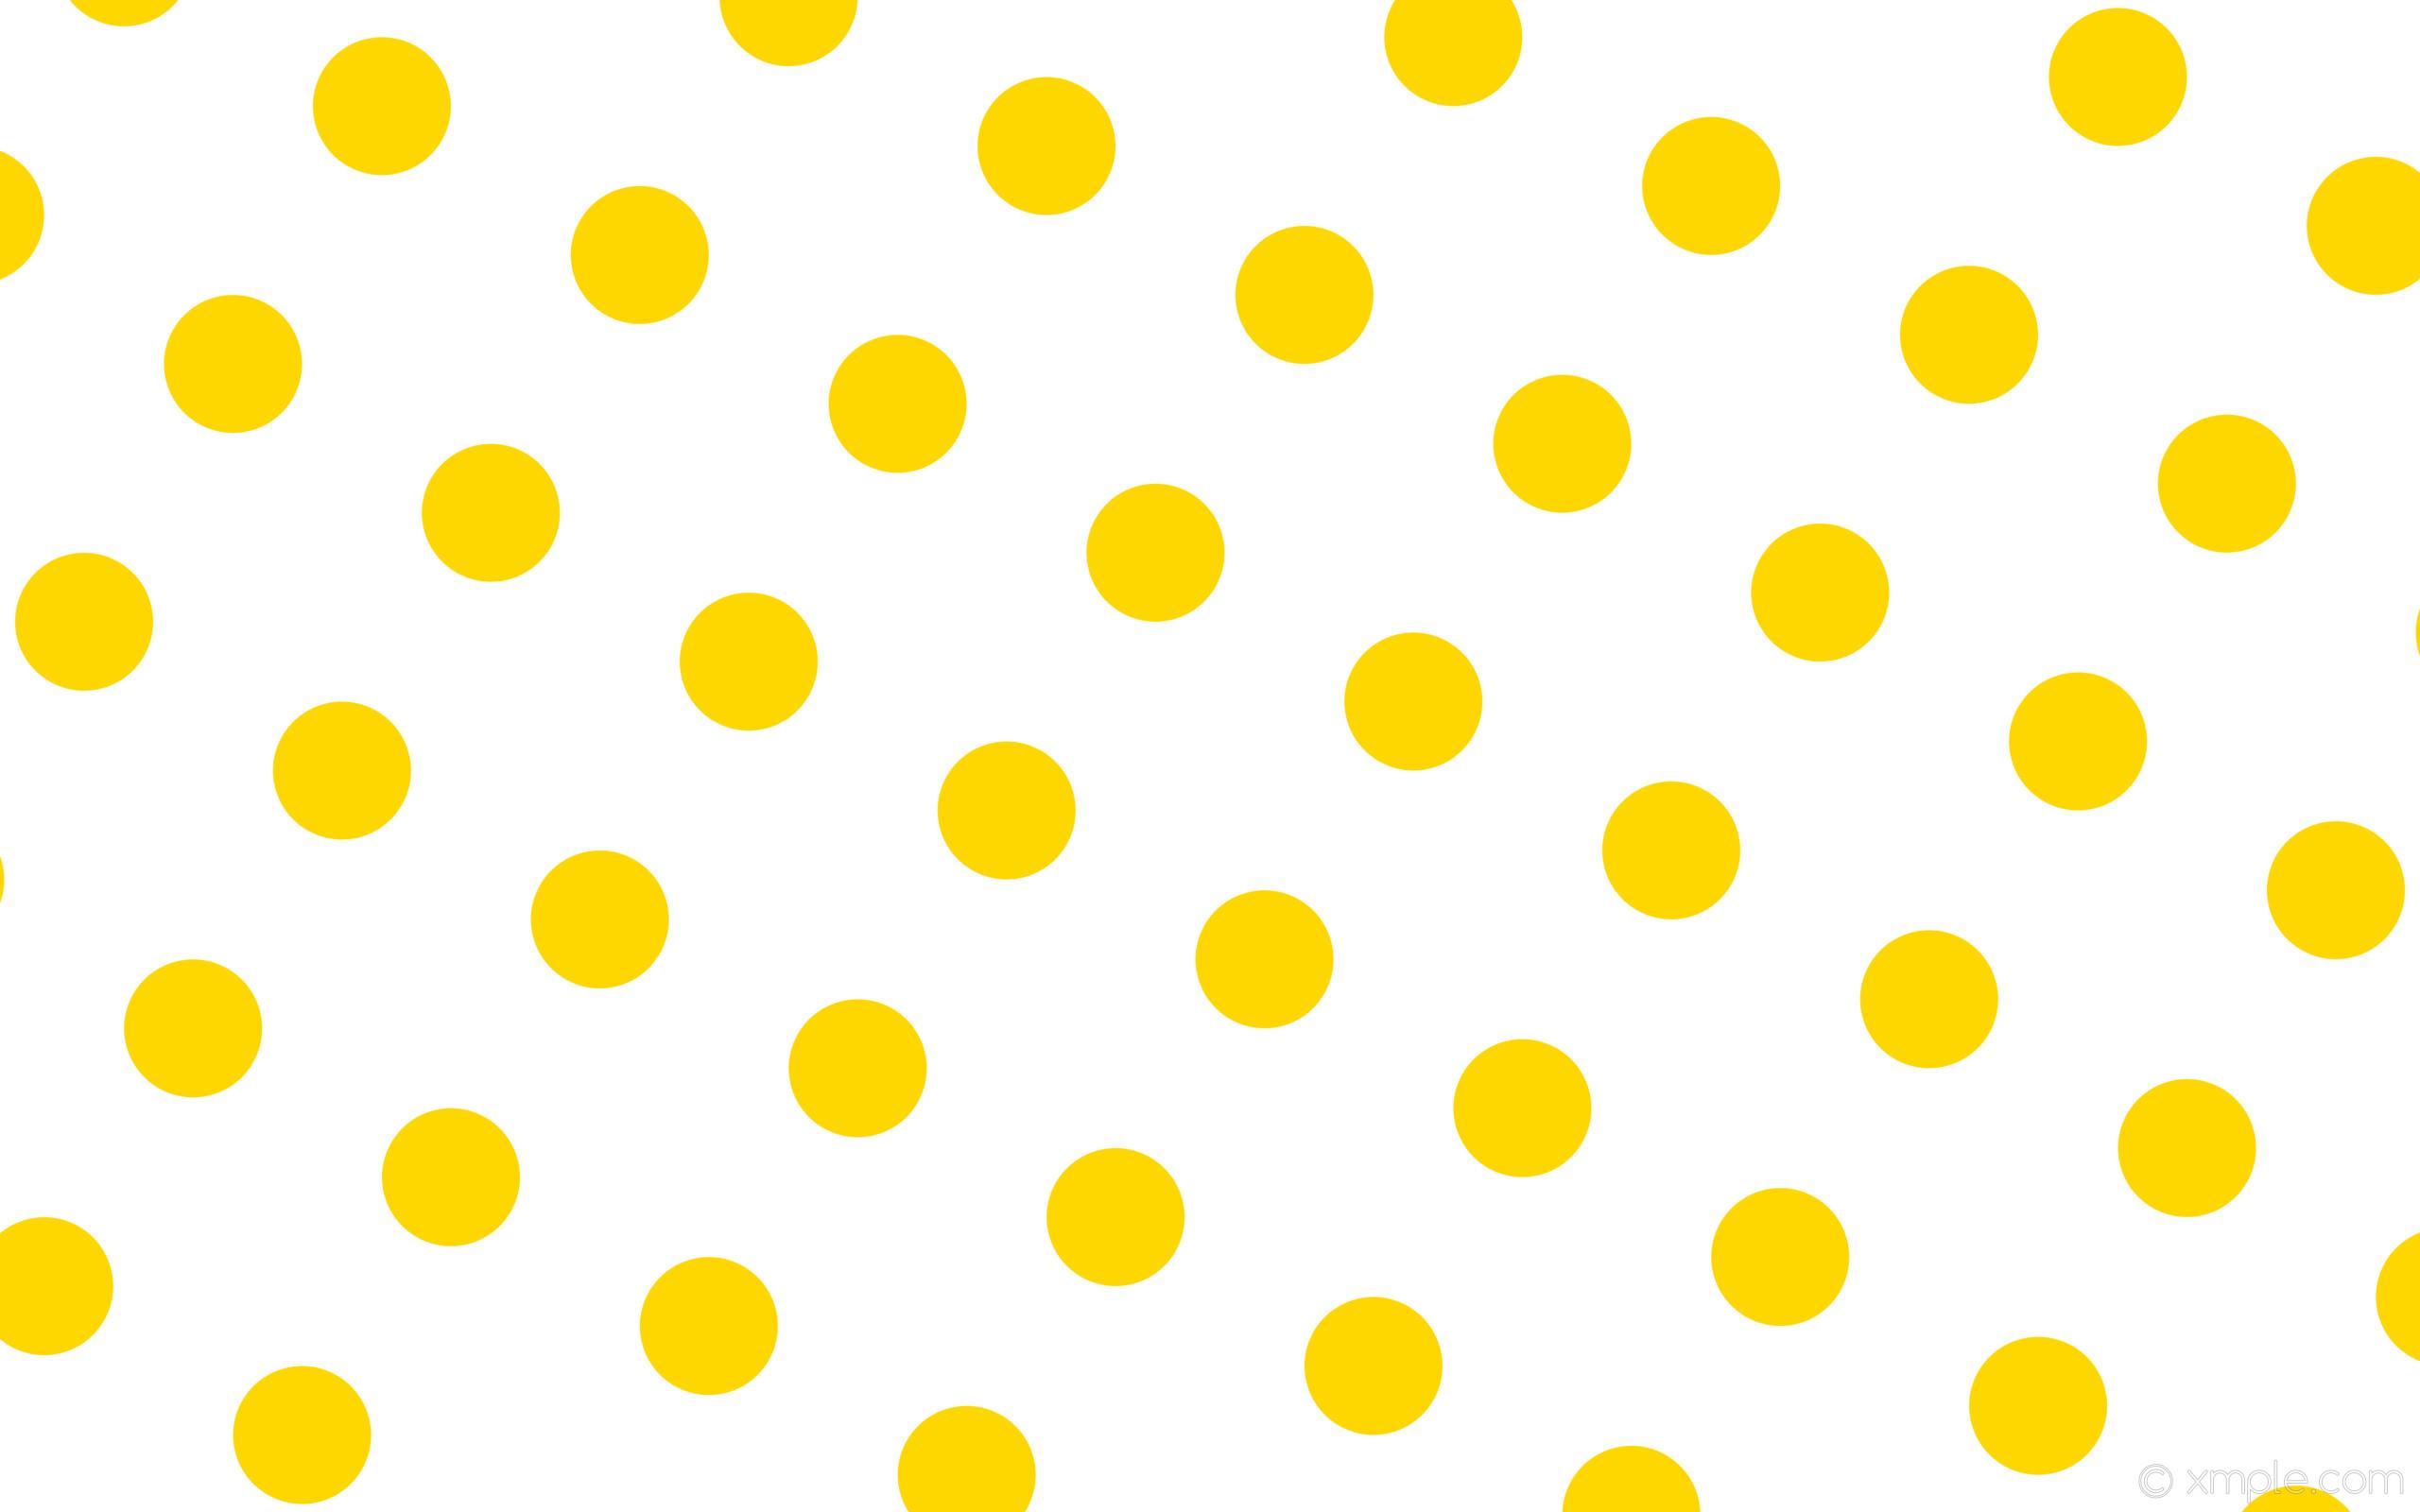 Black And White Dot Wallpaper Yellow Polka Dot Wallpaper 86 Images